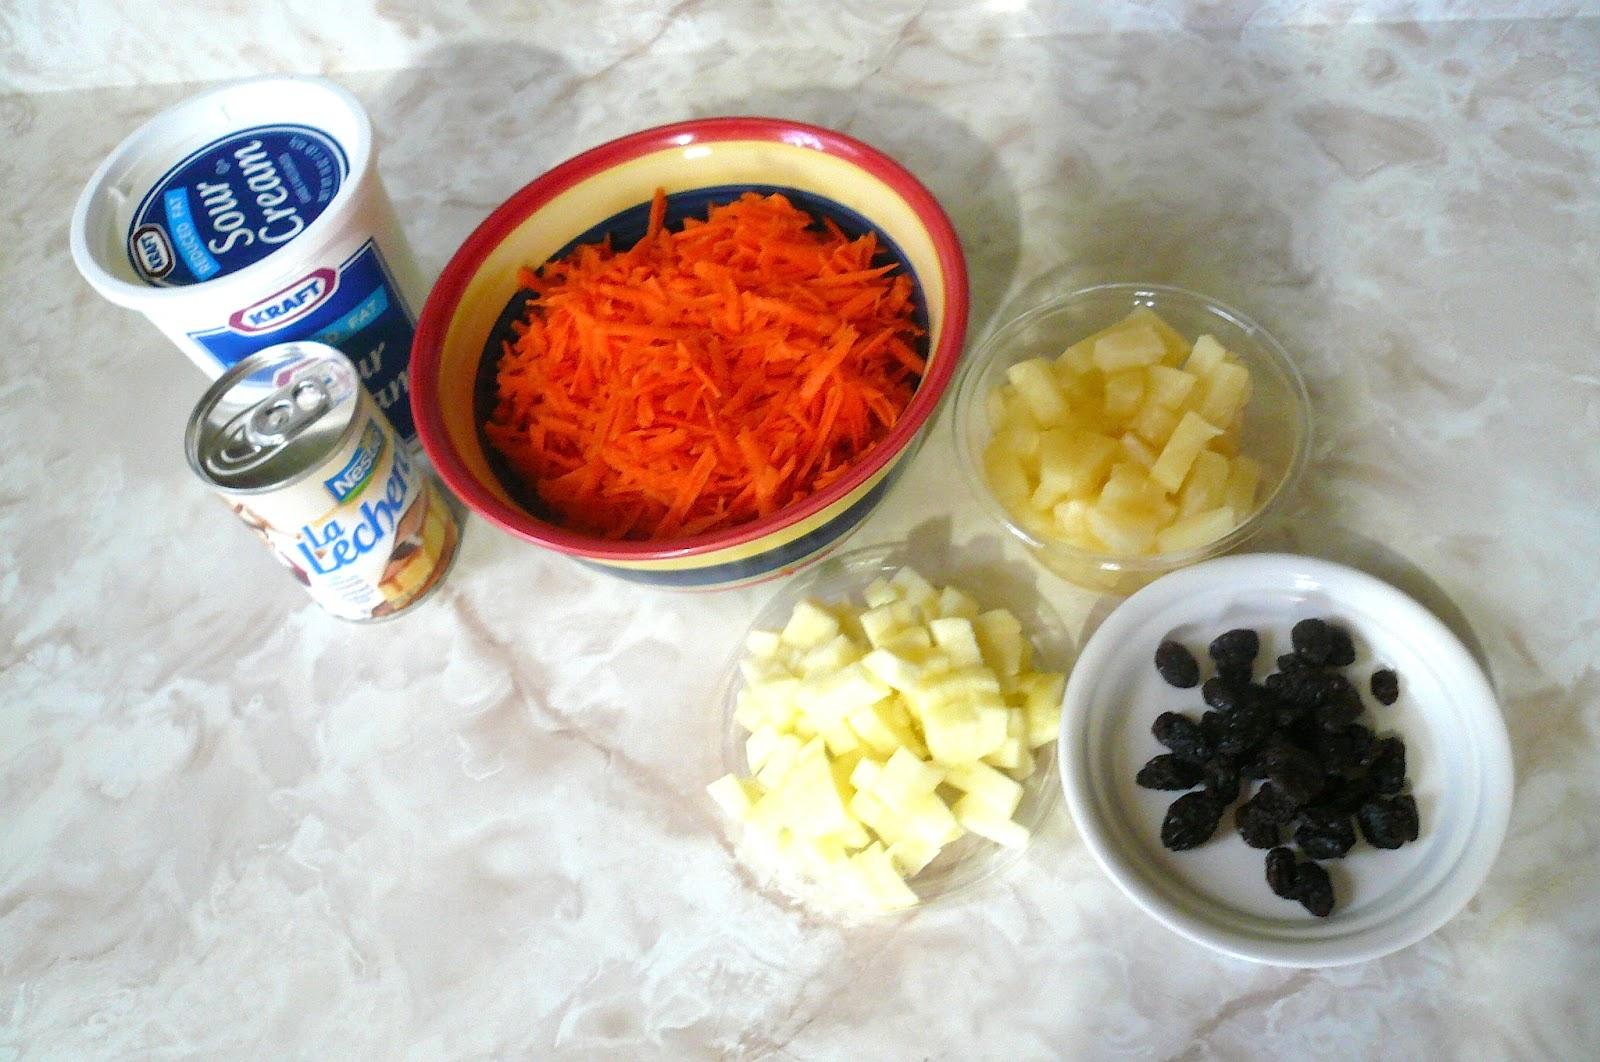 Mi cocina r pida ensalada dulce de zanahoria - Dulce de zanahoria ...